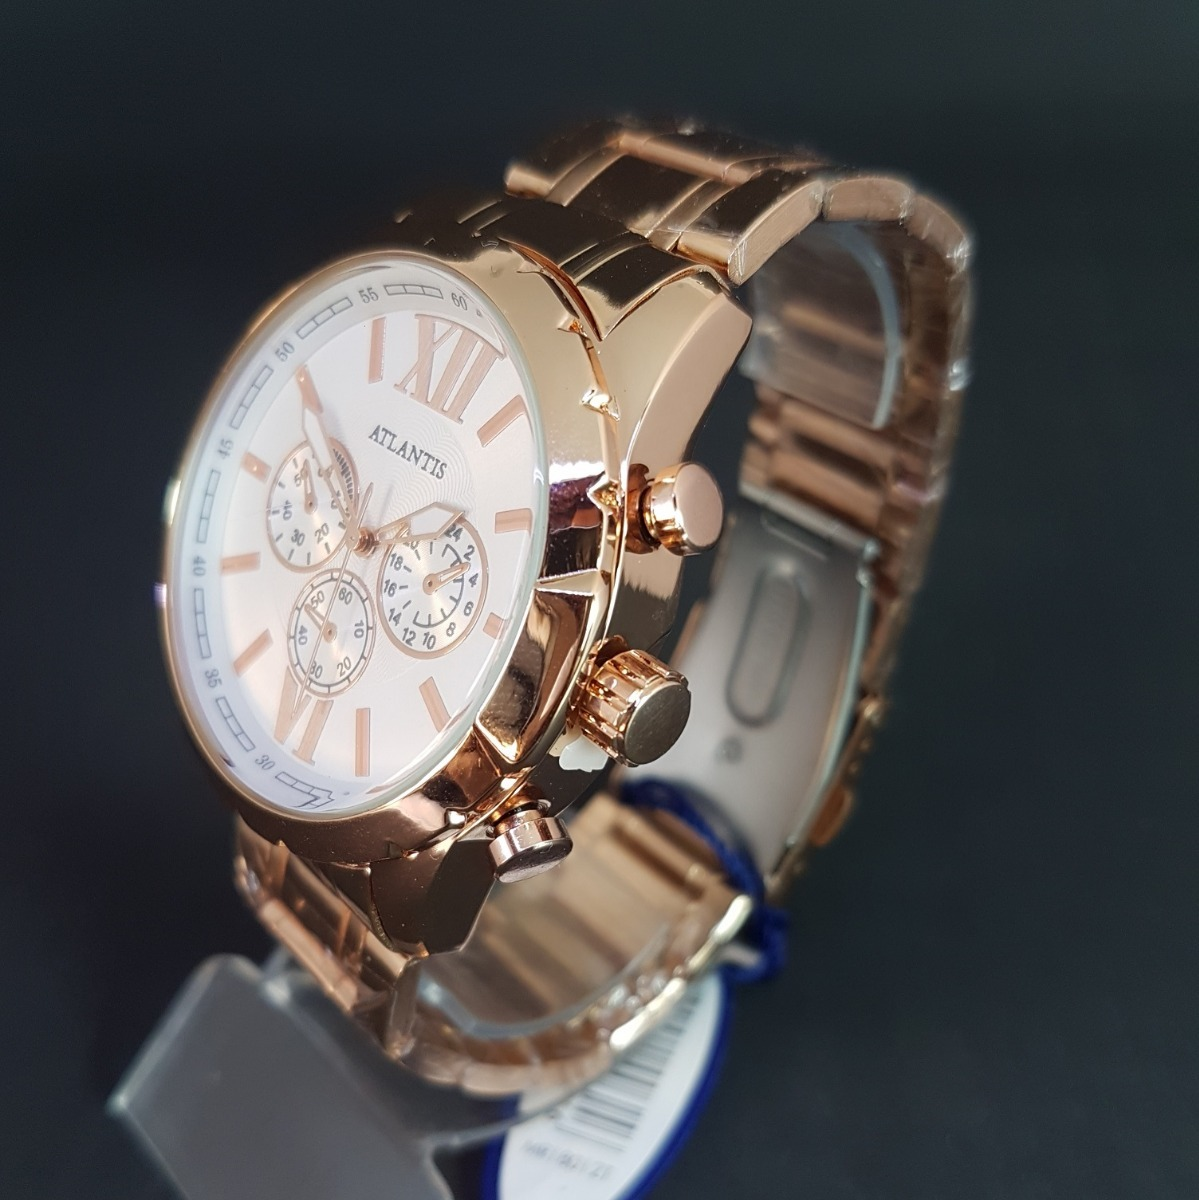 6b68dcecee0 relógio feminino grande barato dourado original atlantis. Carregando zoom...  relógio feminino atlantis. Carregando zoom.